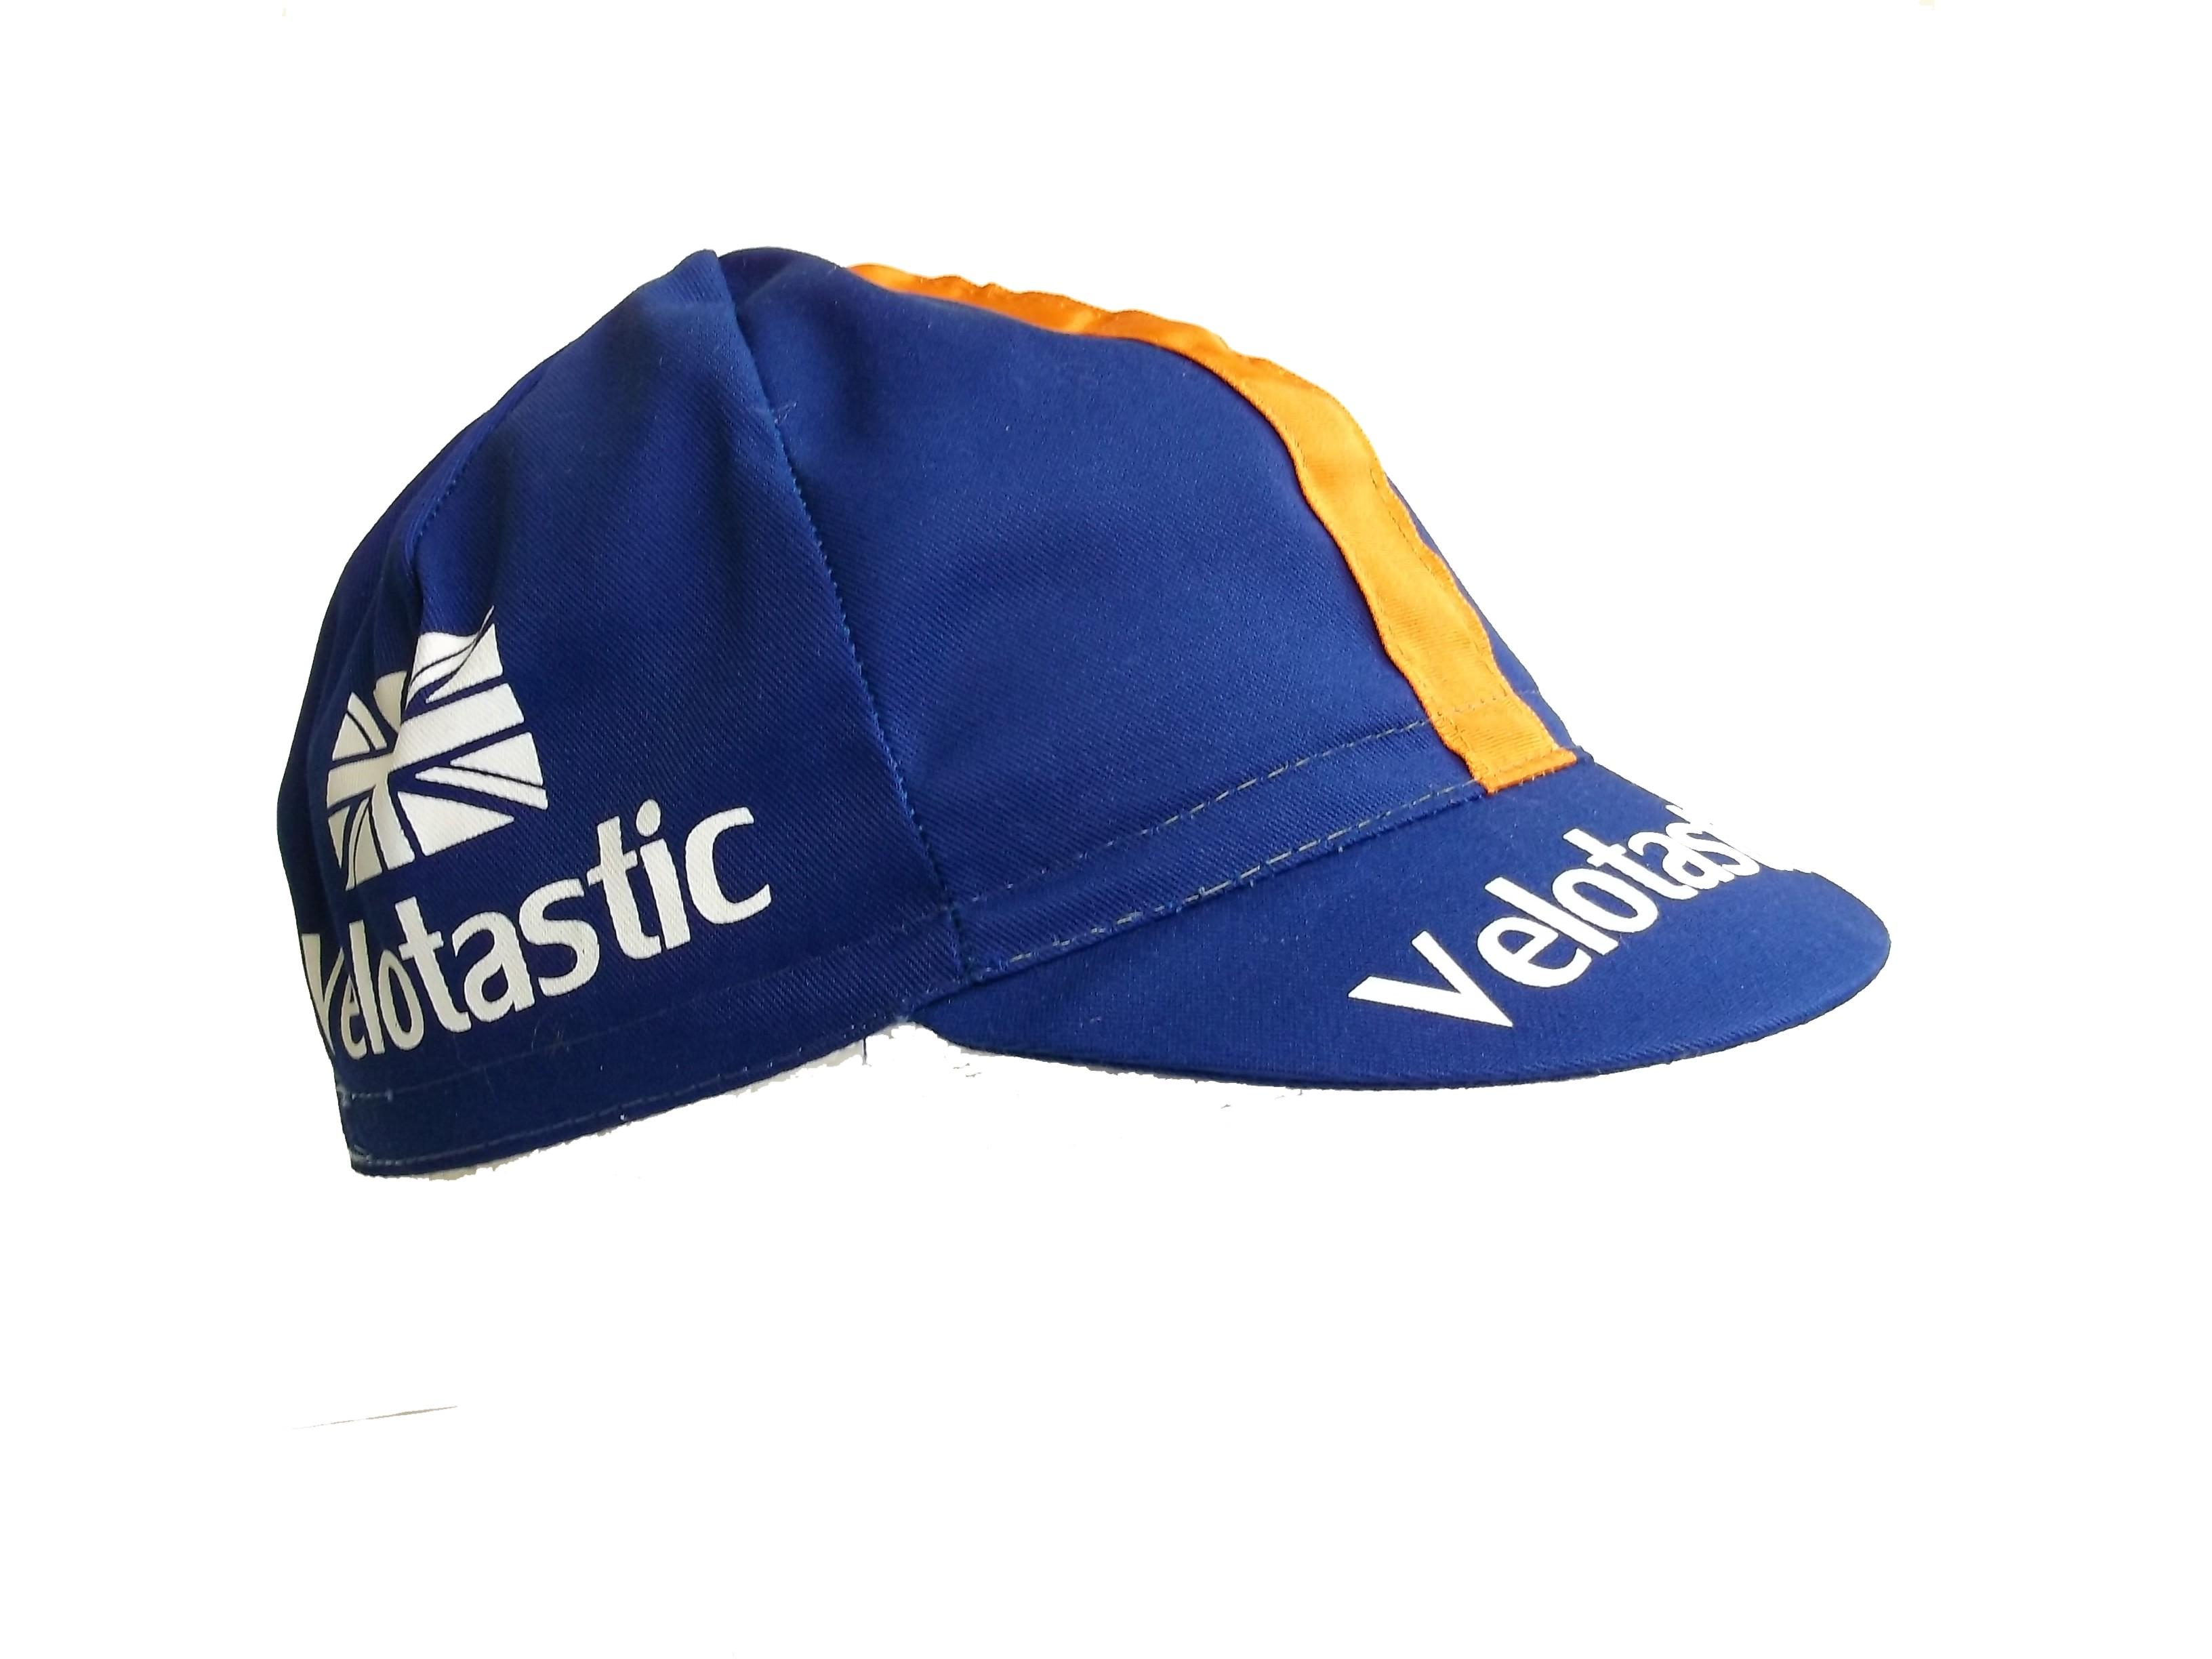 velotastic_cap